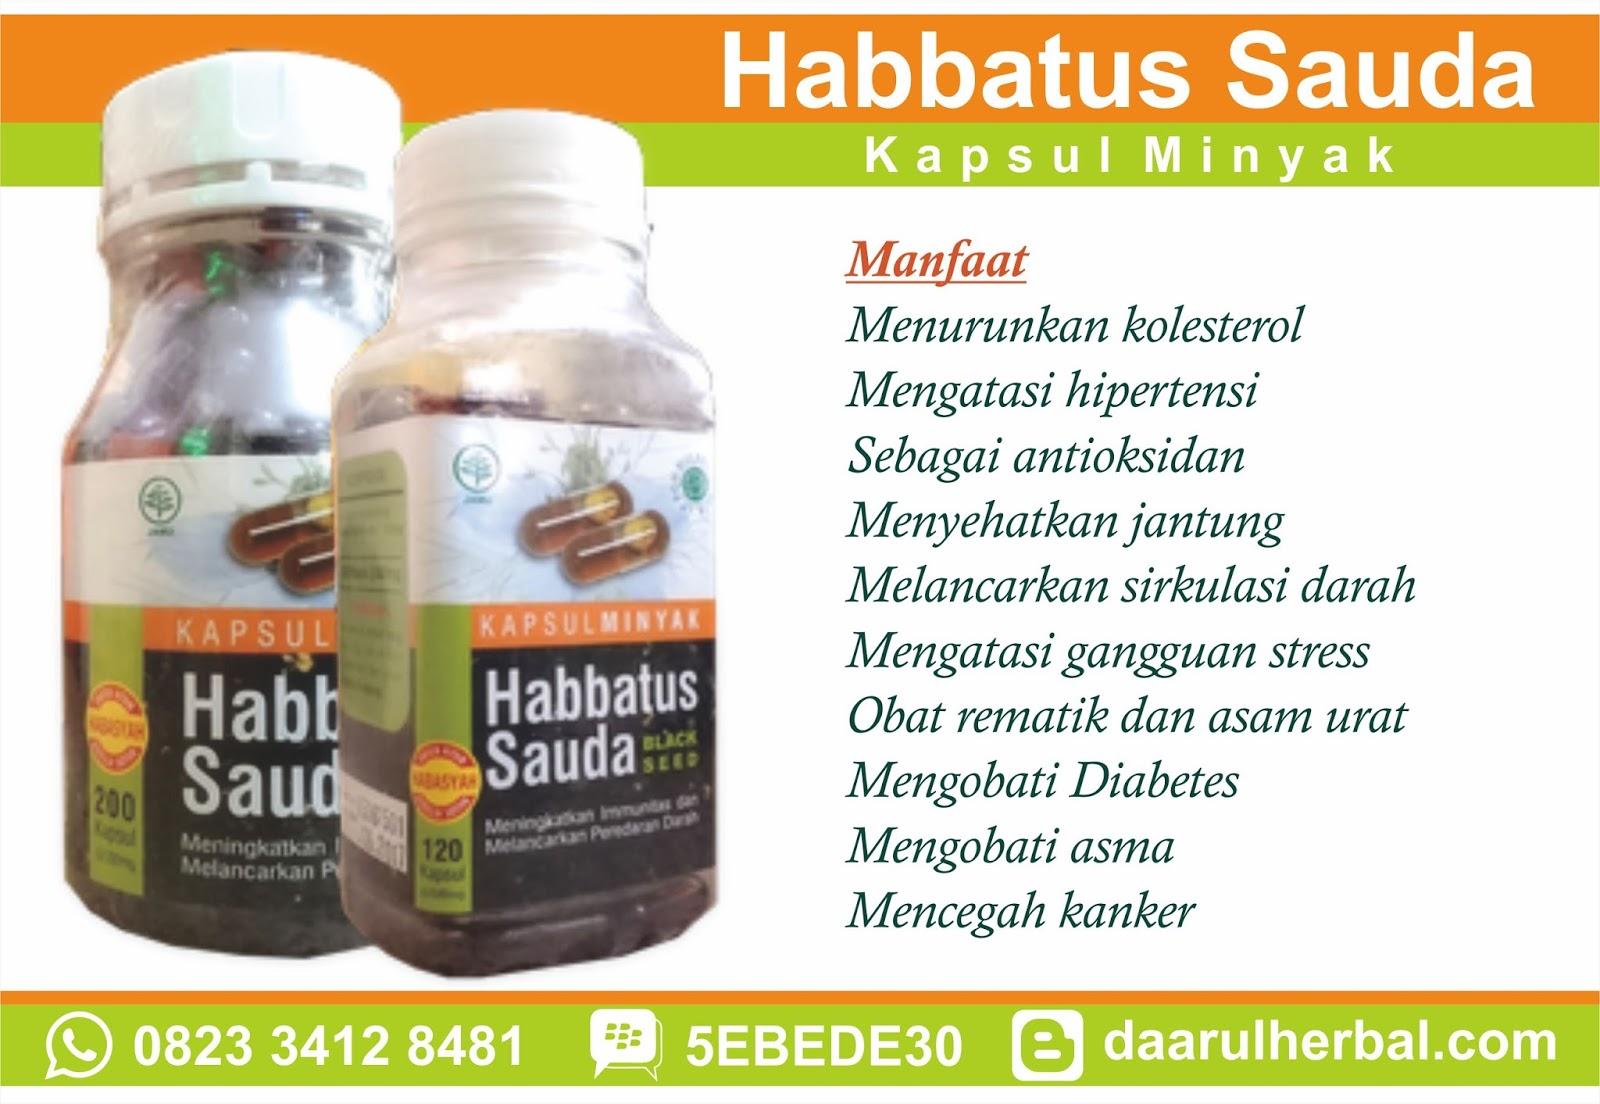 Habbatussauda Kapsul Minyak Herbal Indo Utama Daarul Kurma Ajwa 120 Harga Rp70000 Rp115000 200